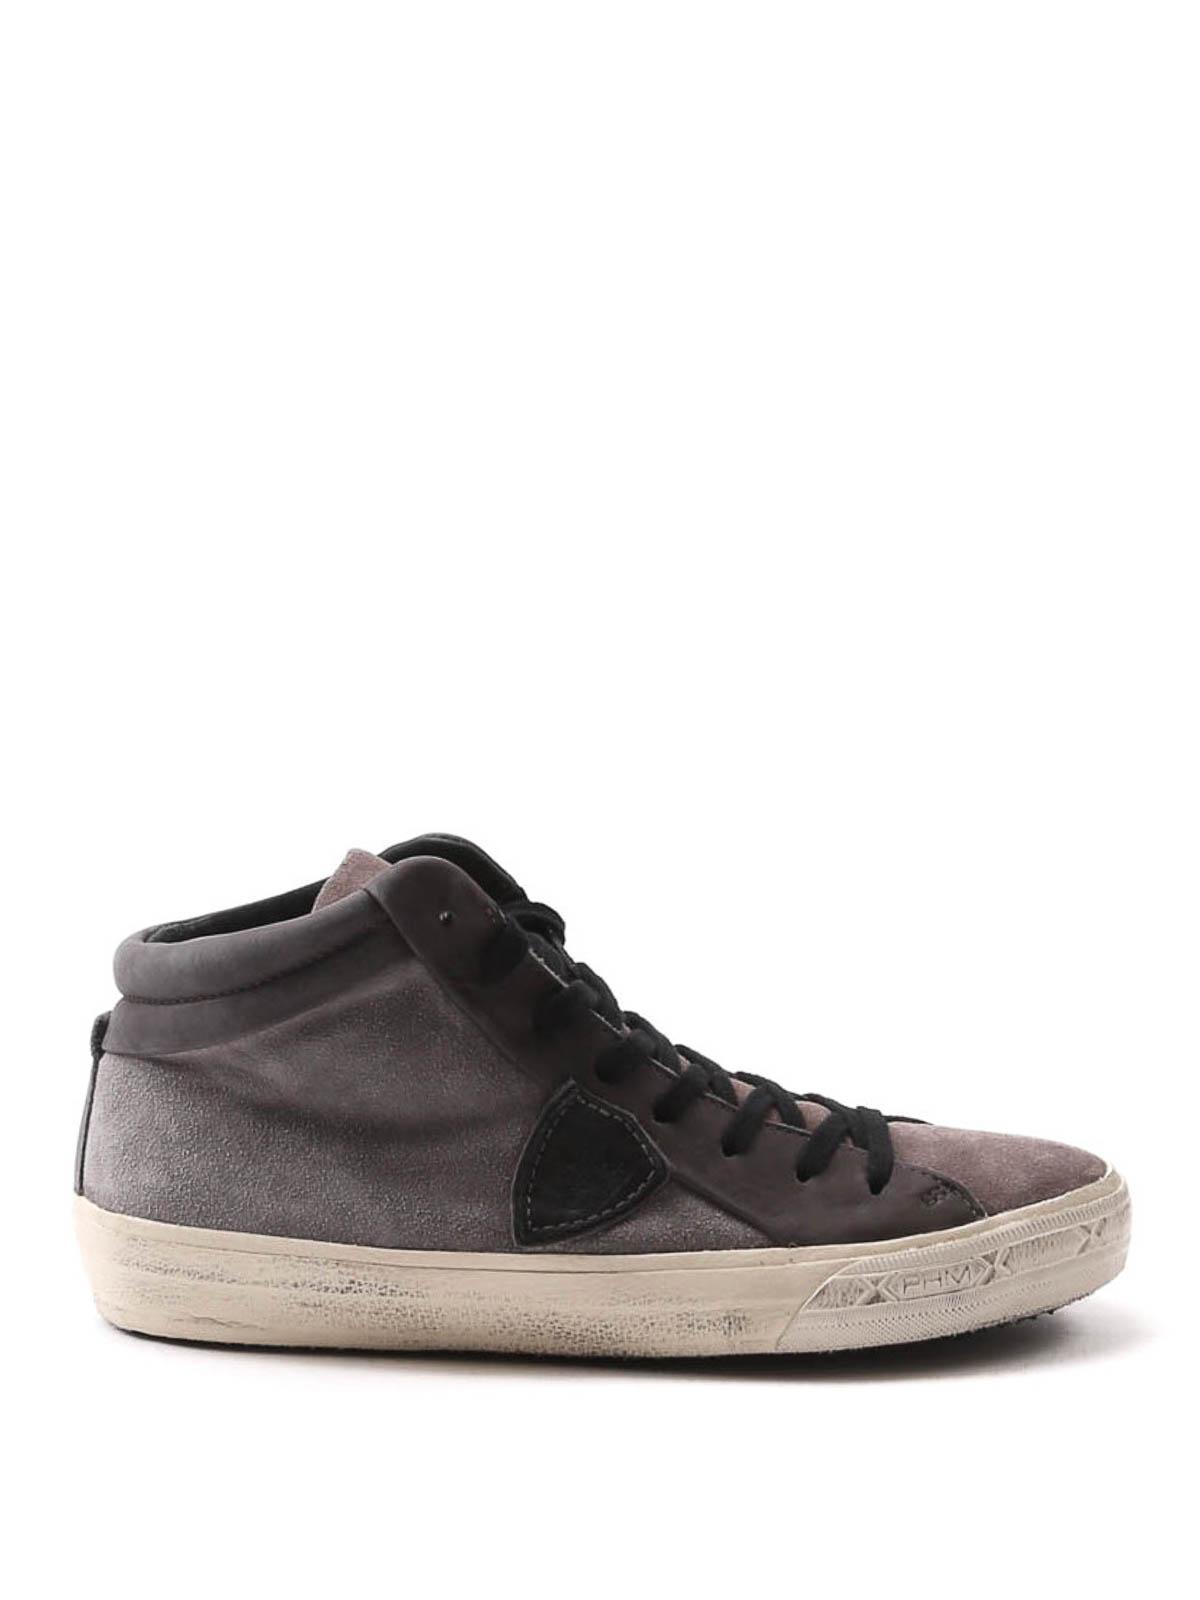 sneaker mid top scamosciate philippe model sneakers ikrix. Black Bedroom Furniture Sets. Home Design Ideas